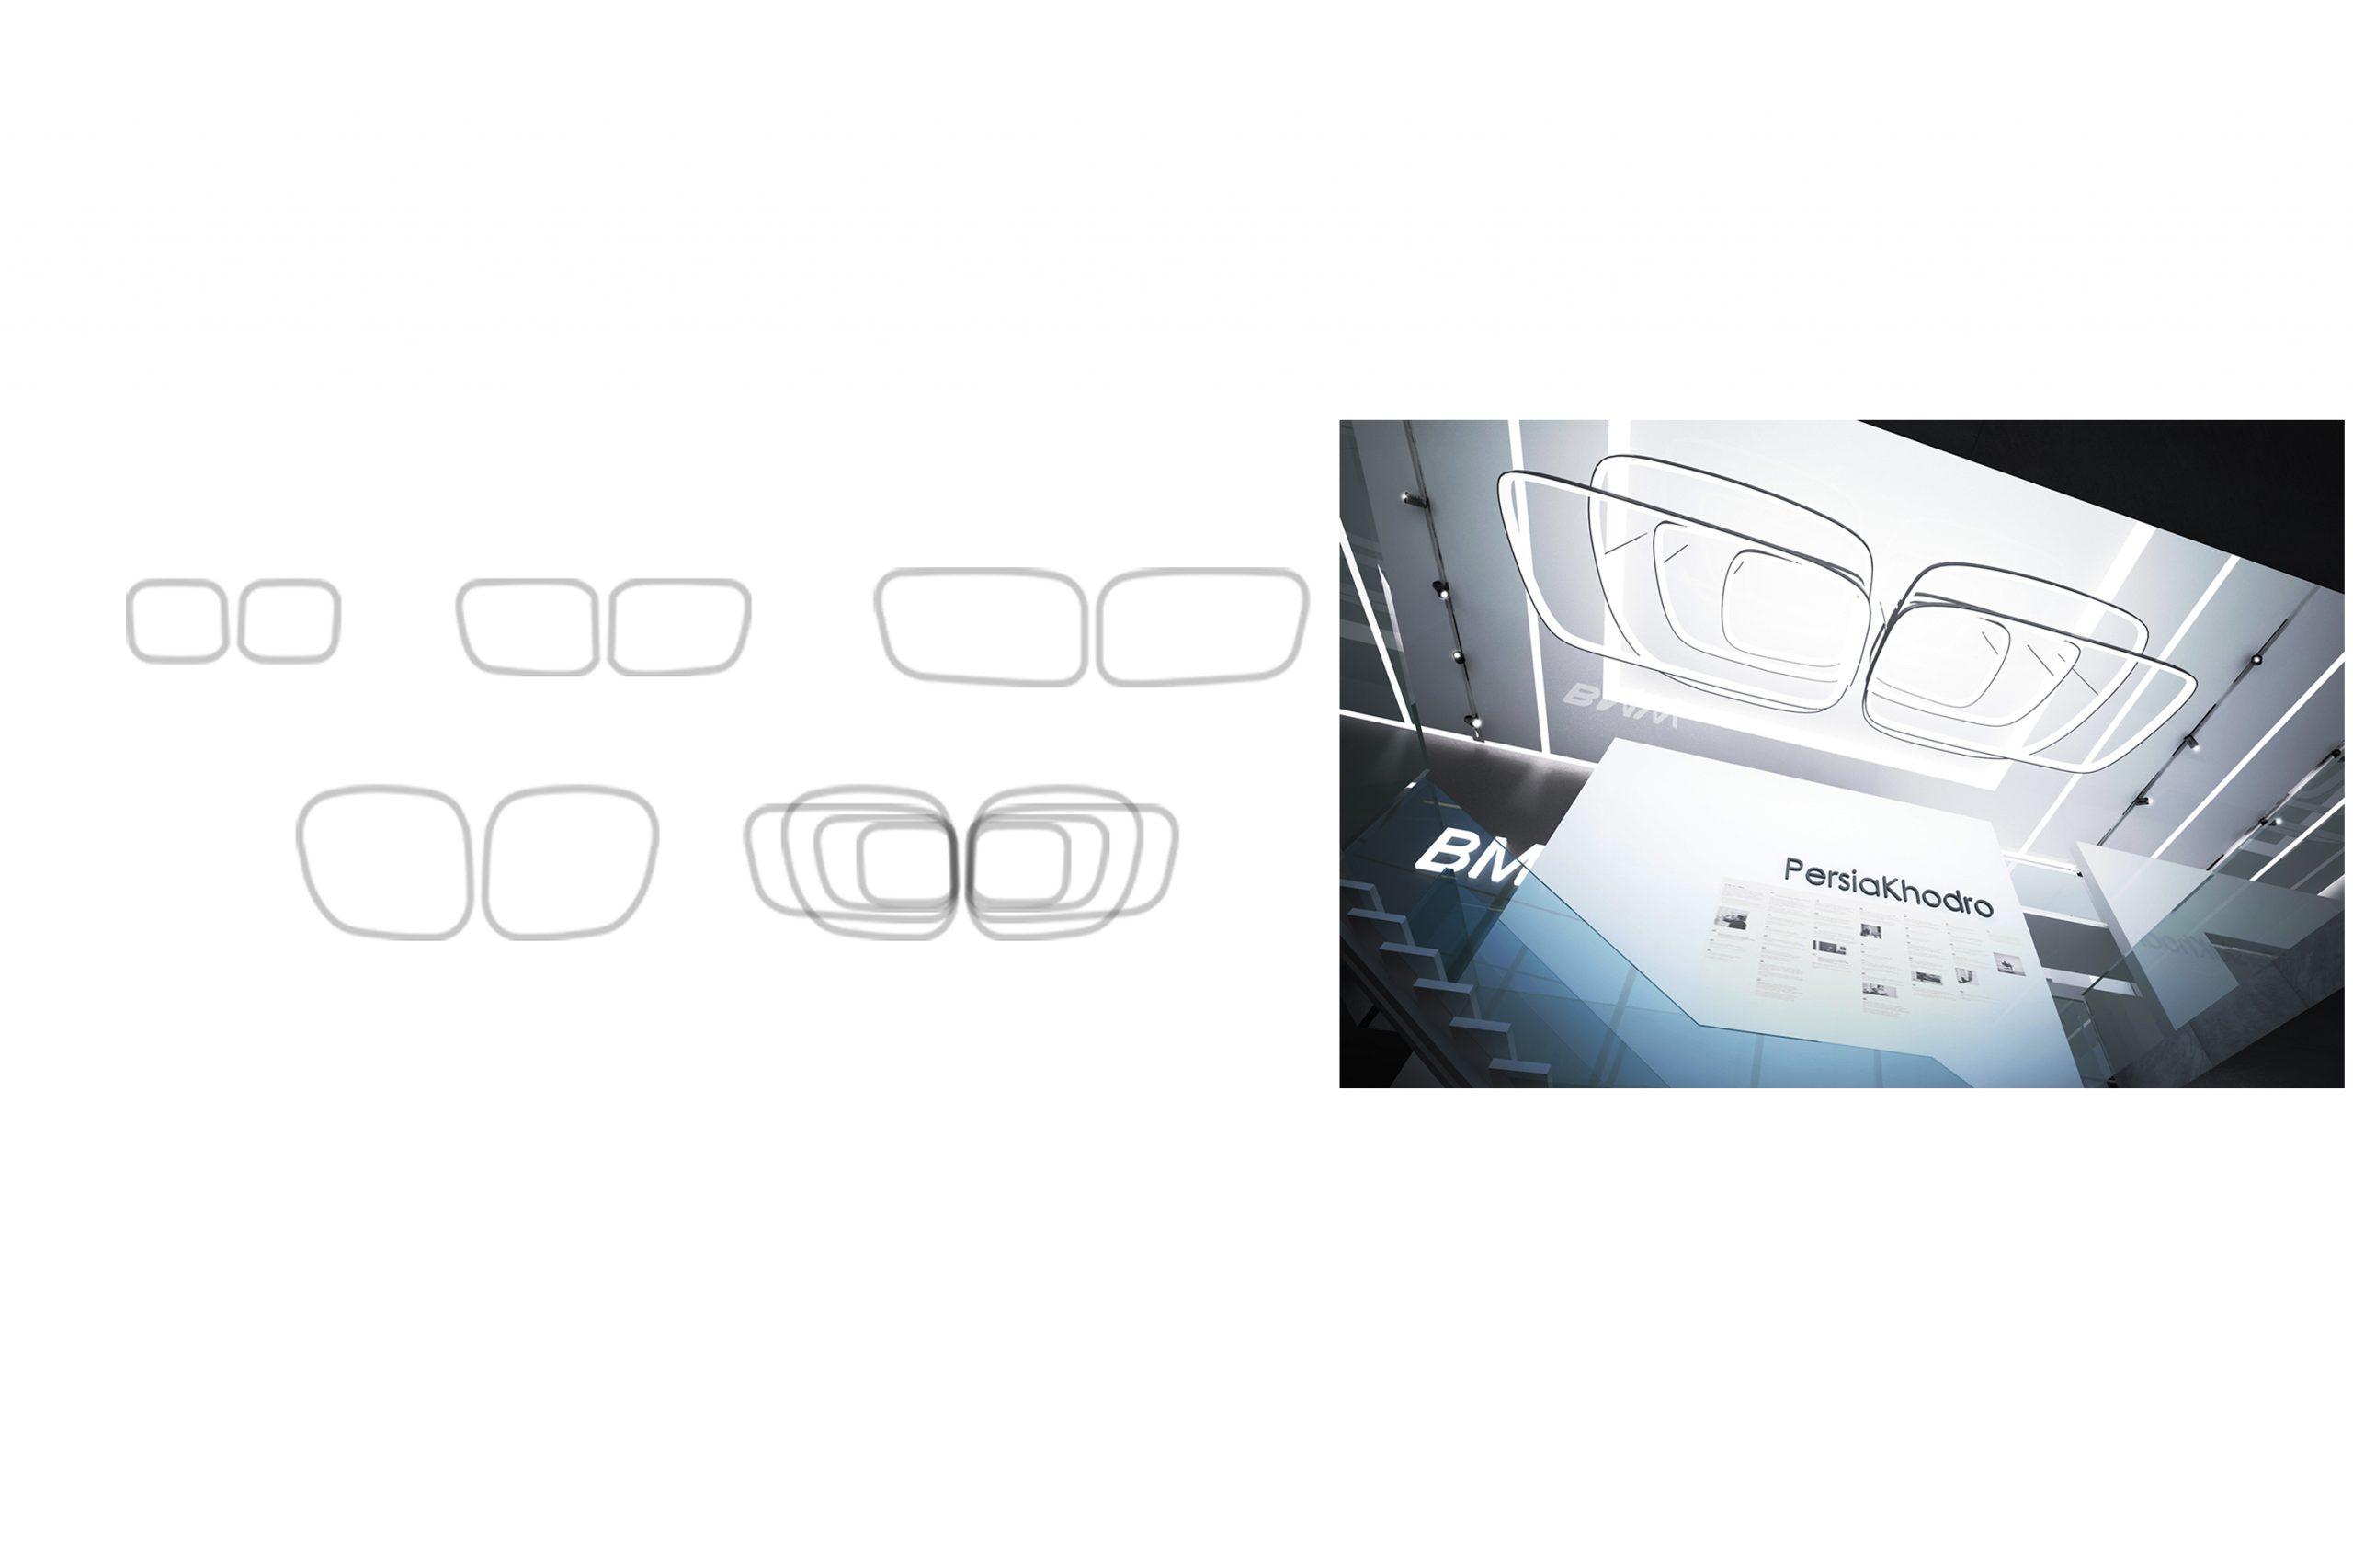 BMW-Showroom & Accessories Center 06